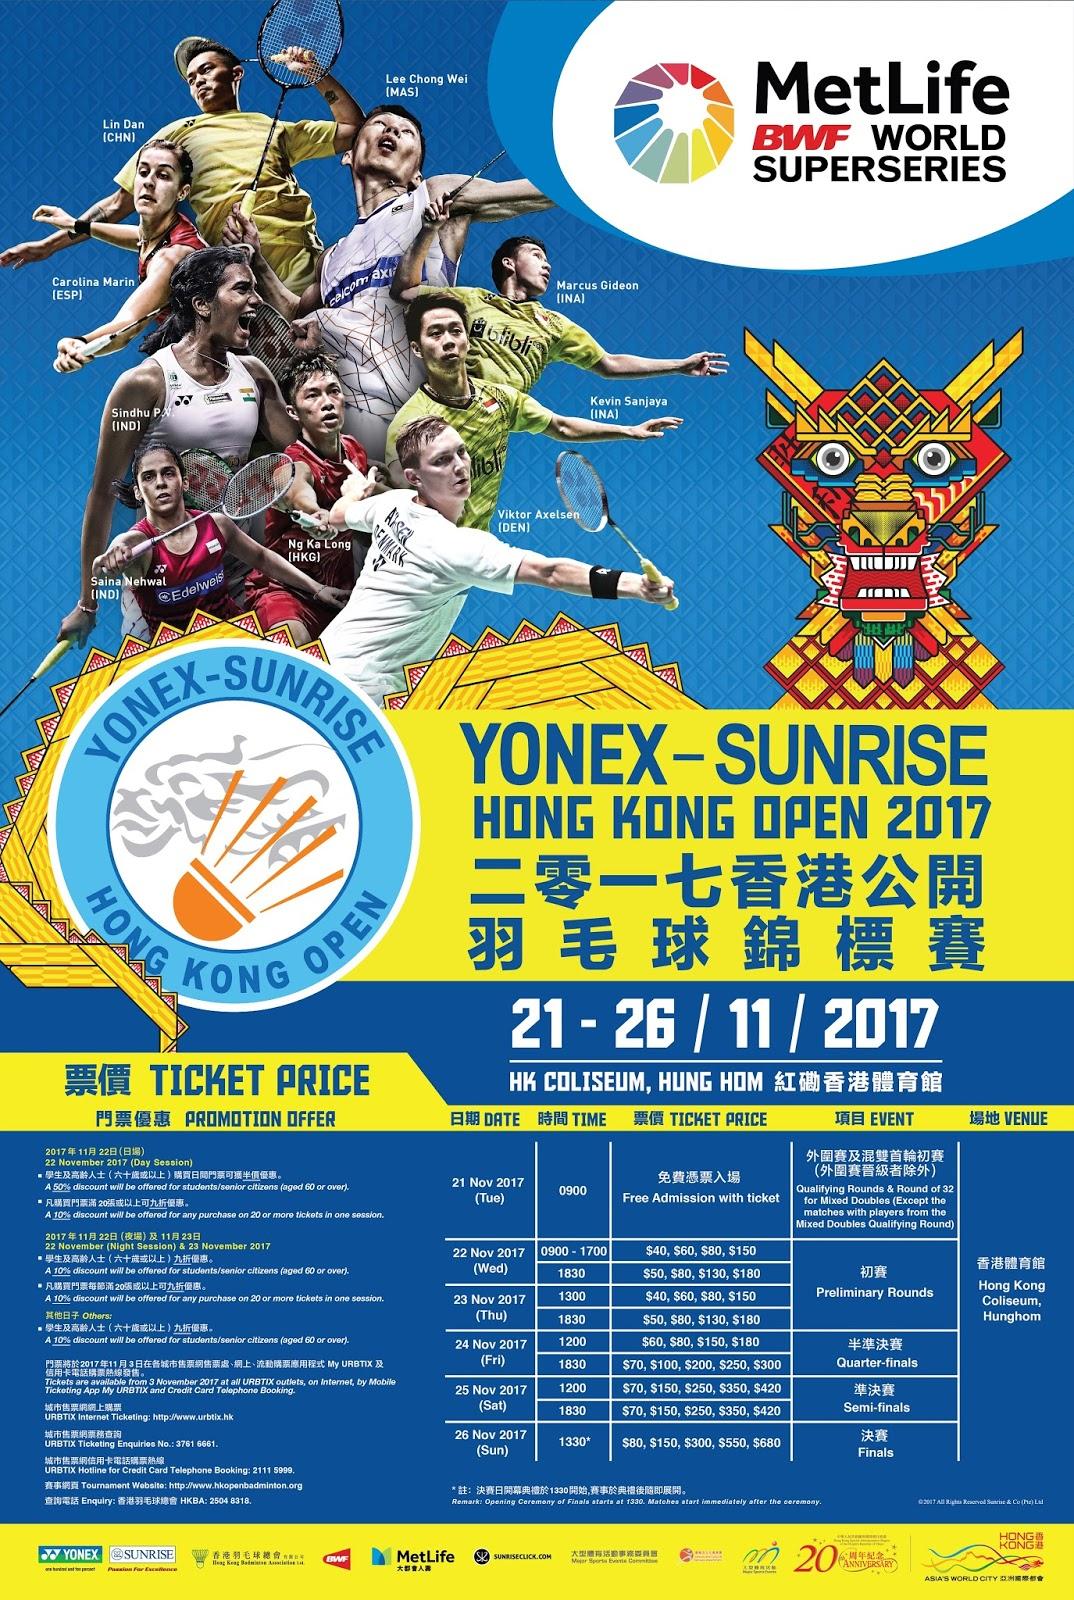 Jadwal Live Streaming Yonex Sunrise Hong Kong Open Super